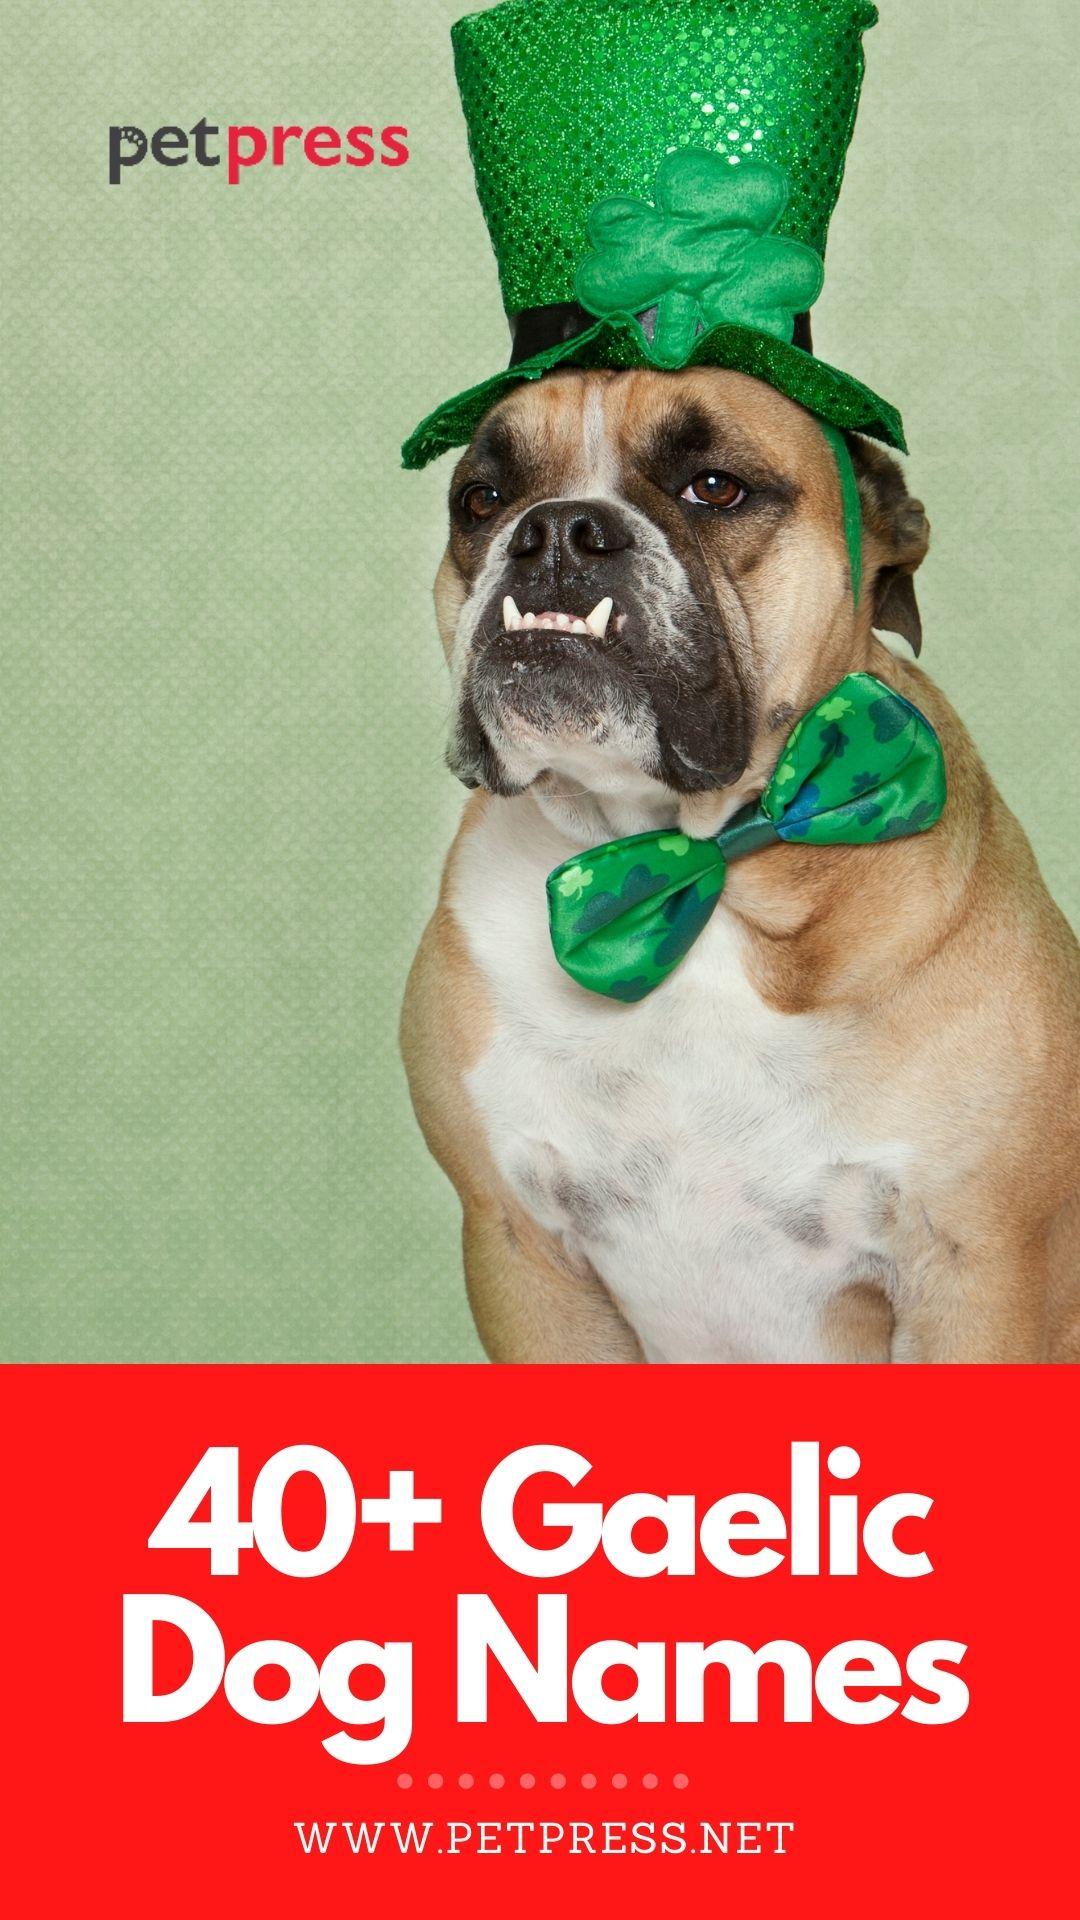 gaelic dog names for naming a dog